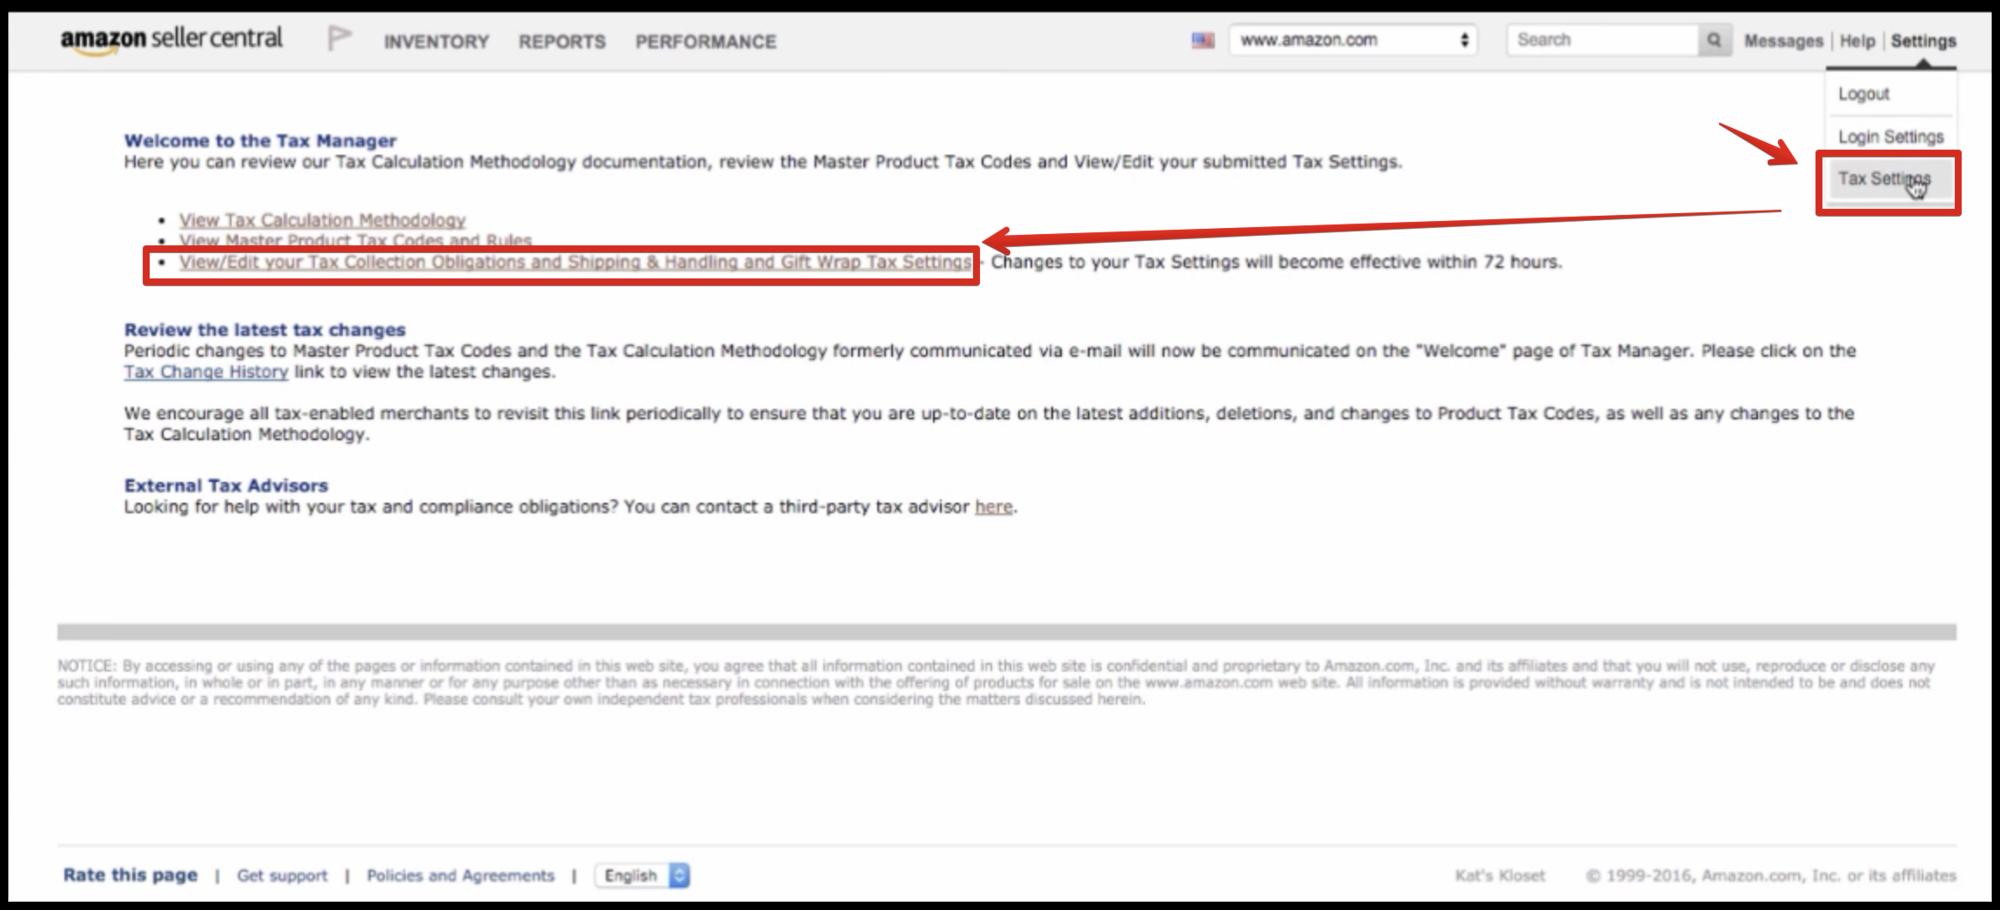 Amazon美国销售税怎么计算?跨境电商卖家怎么缴各州跨境销售税